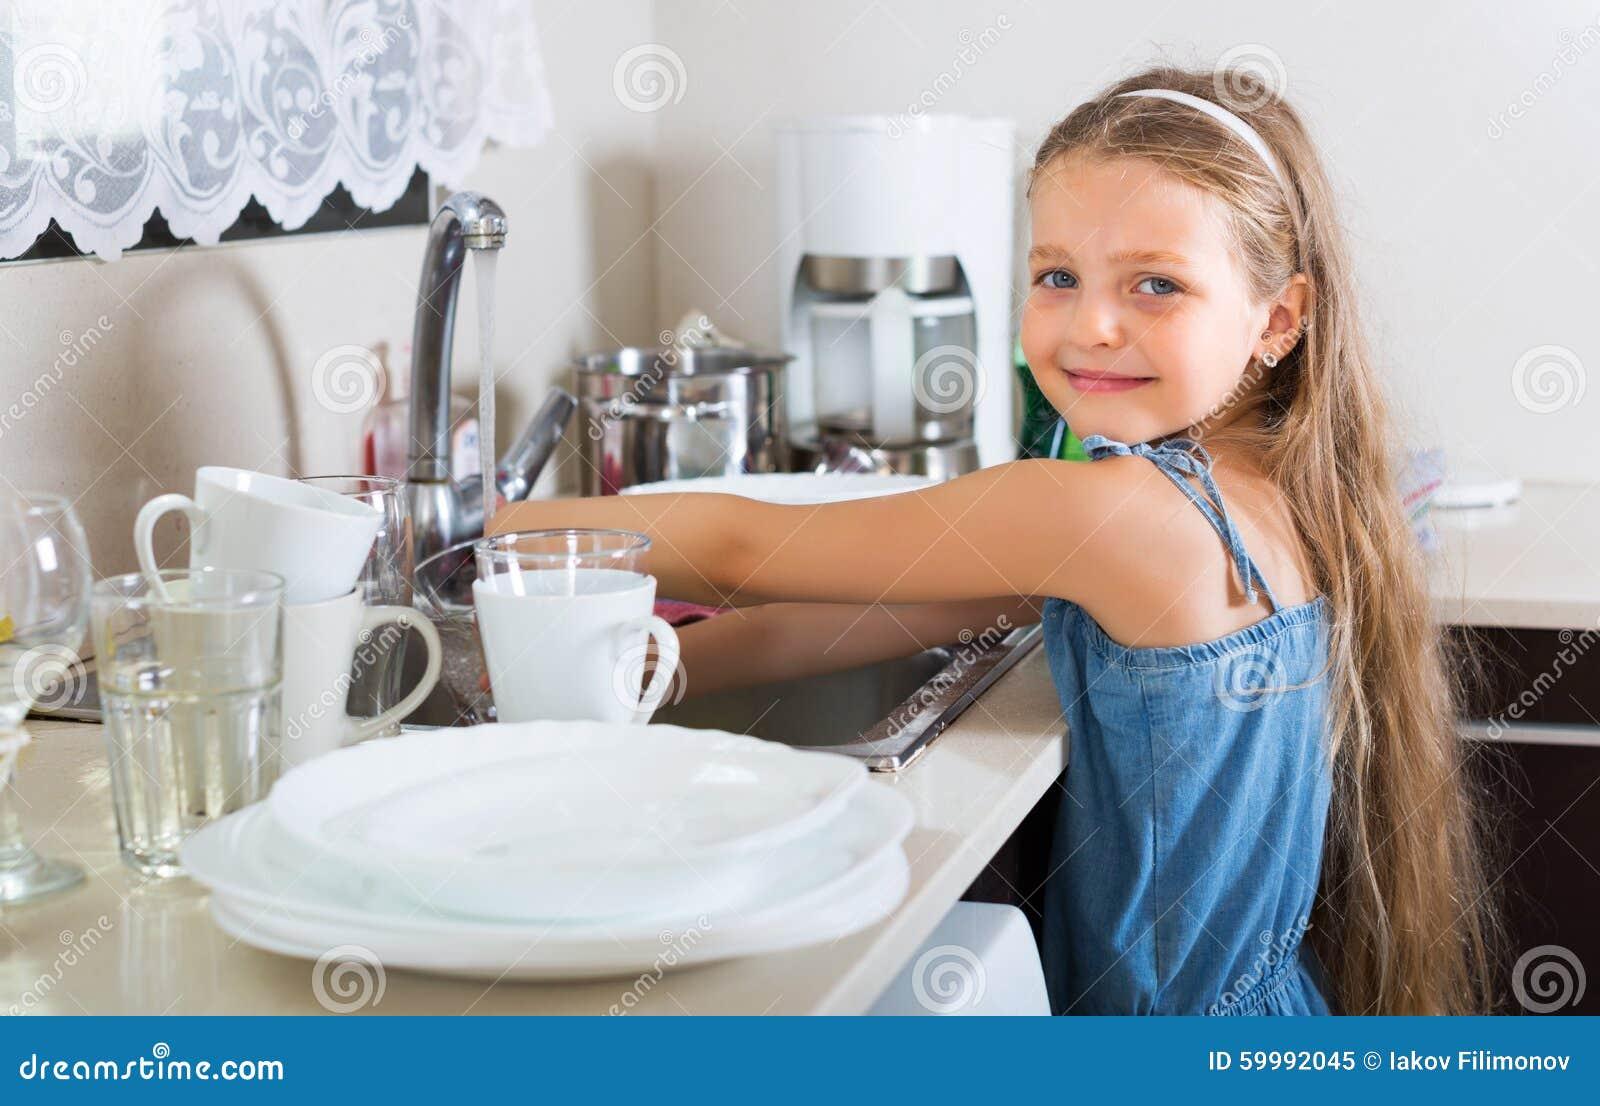 kitchen newcastle private girls